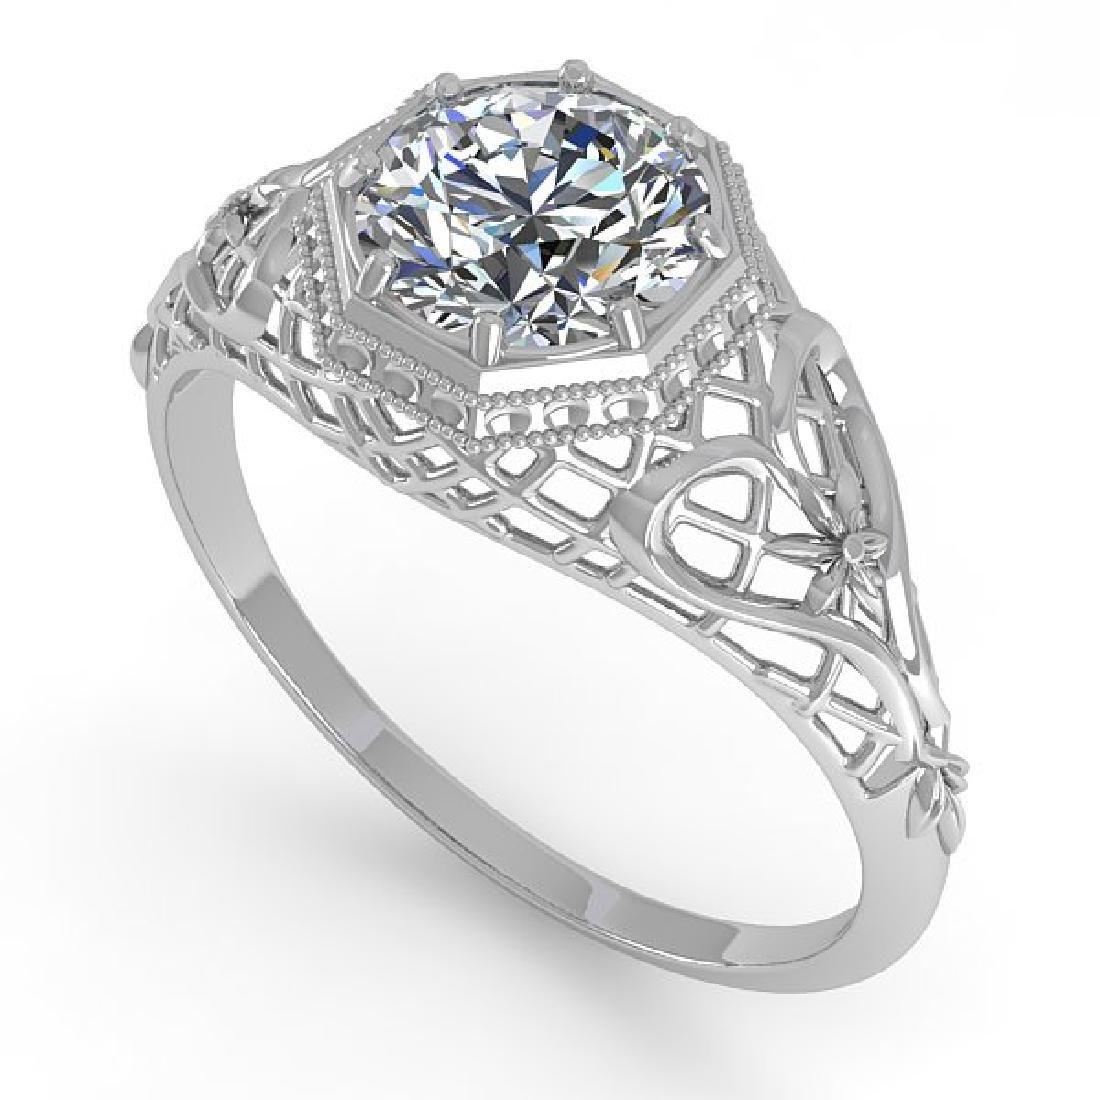 1.01 CTW VS/SI Diamond Solitaire Ring 14K White Gold - 2